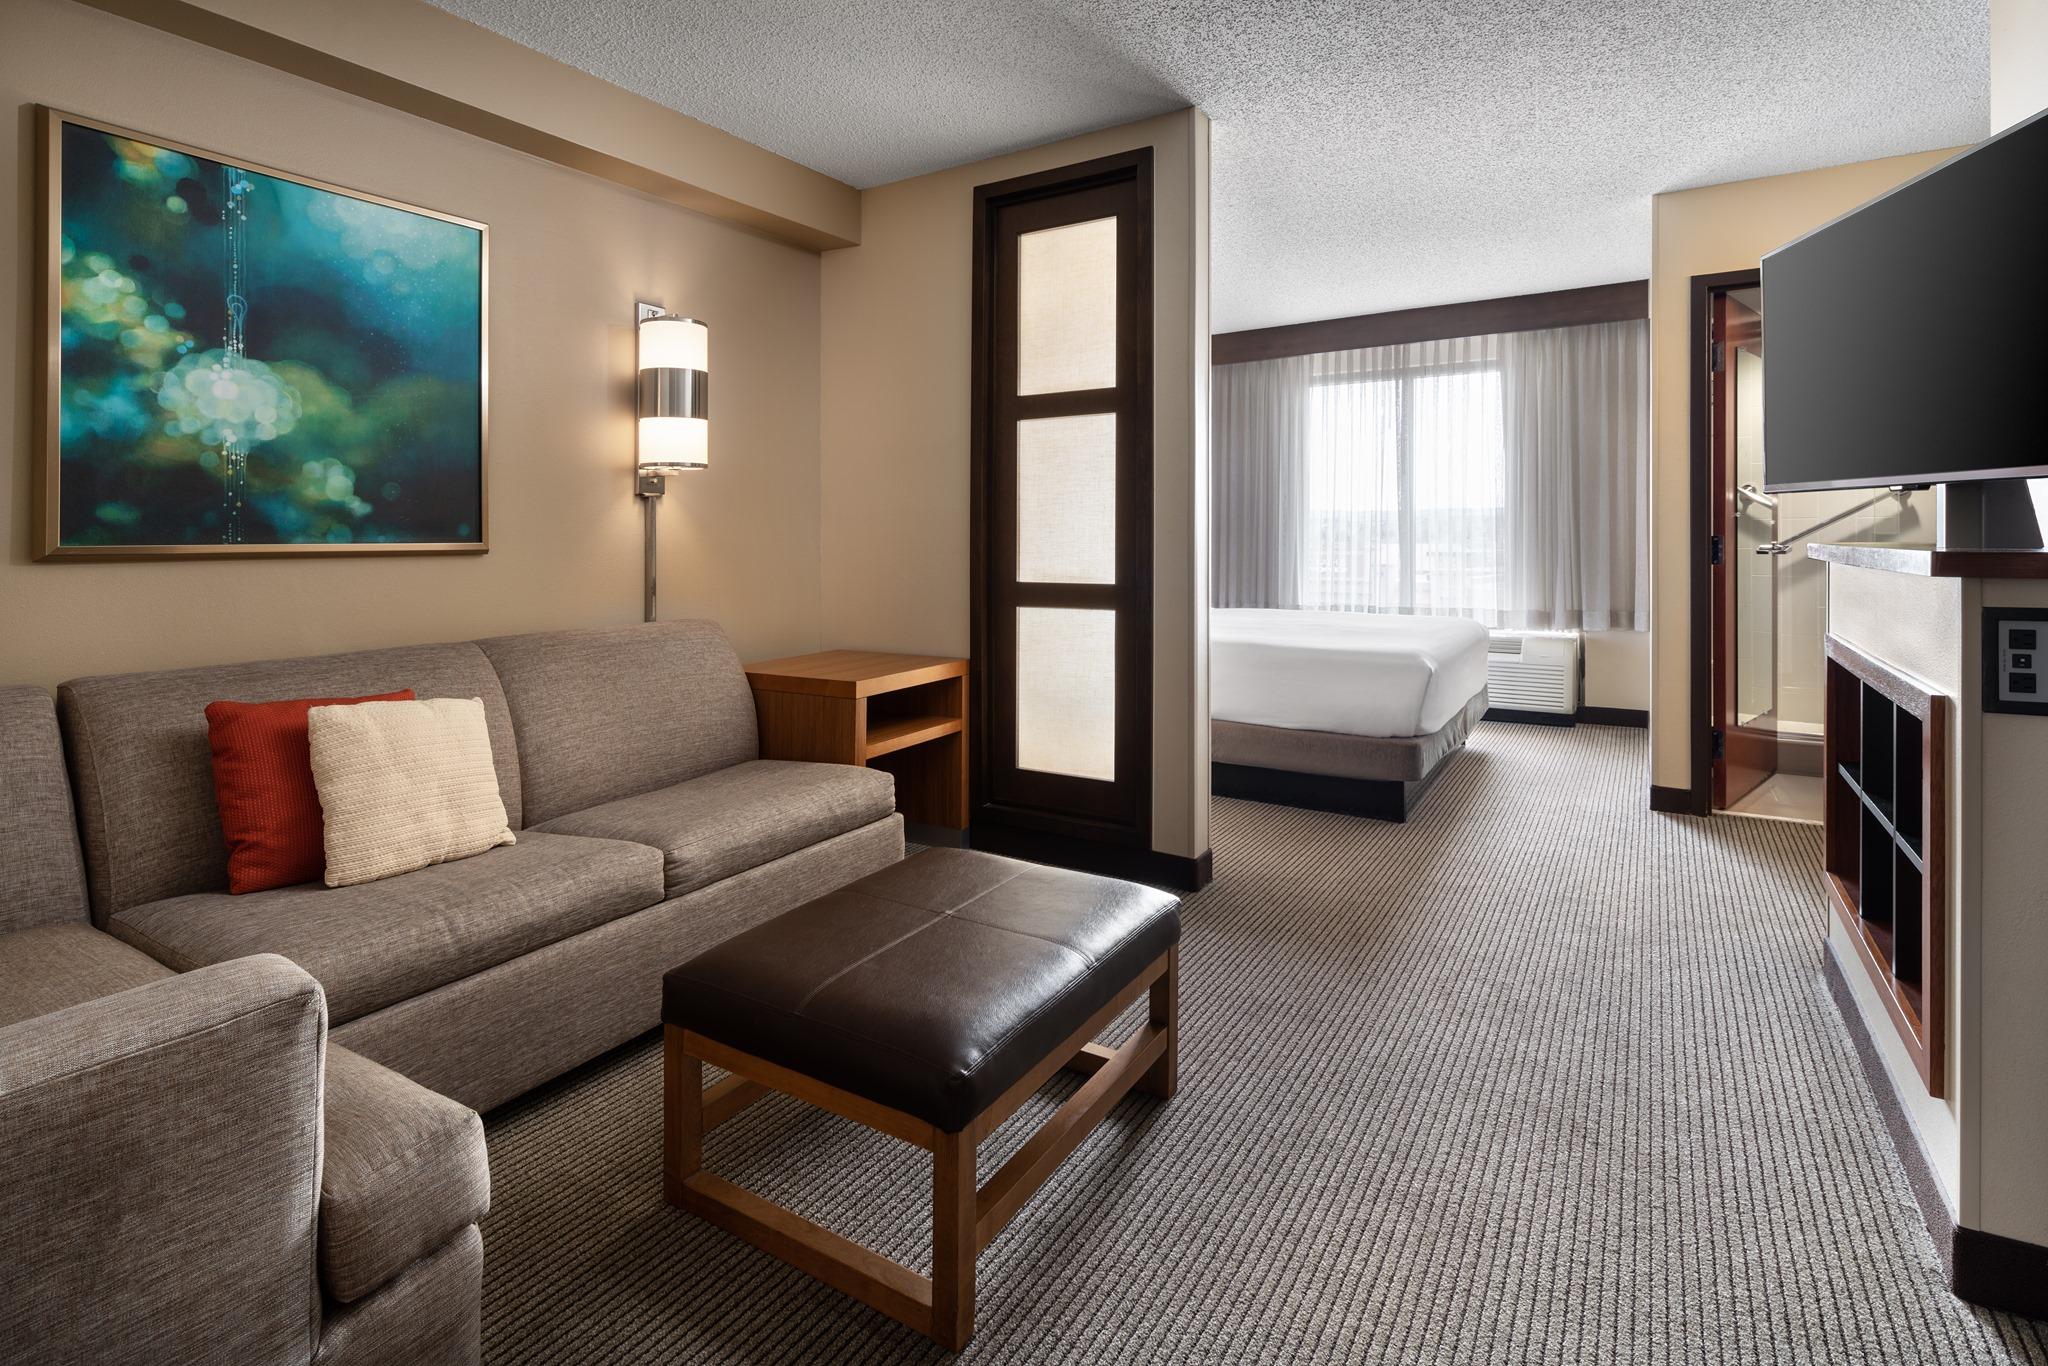 suites at hyatt place hotel in greenwood village